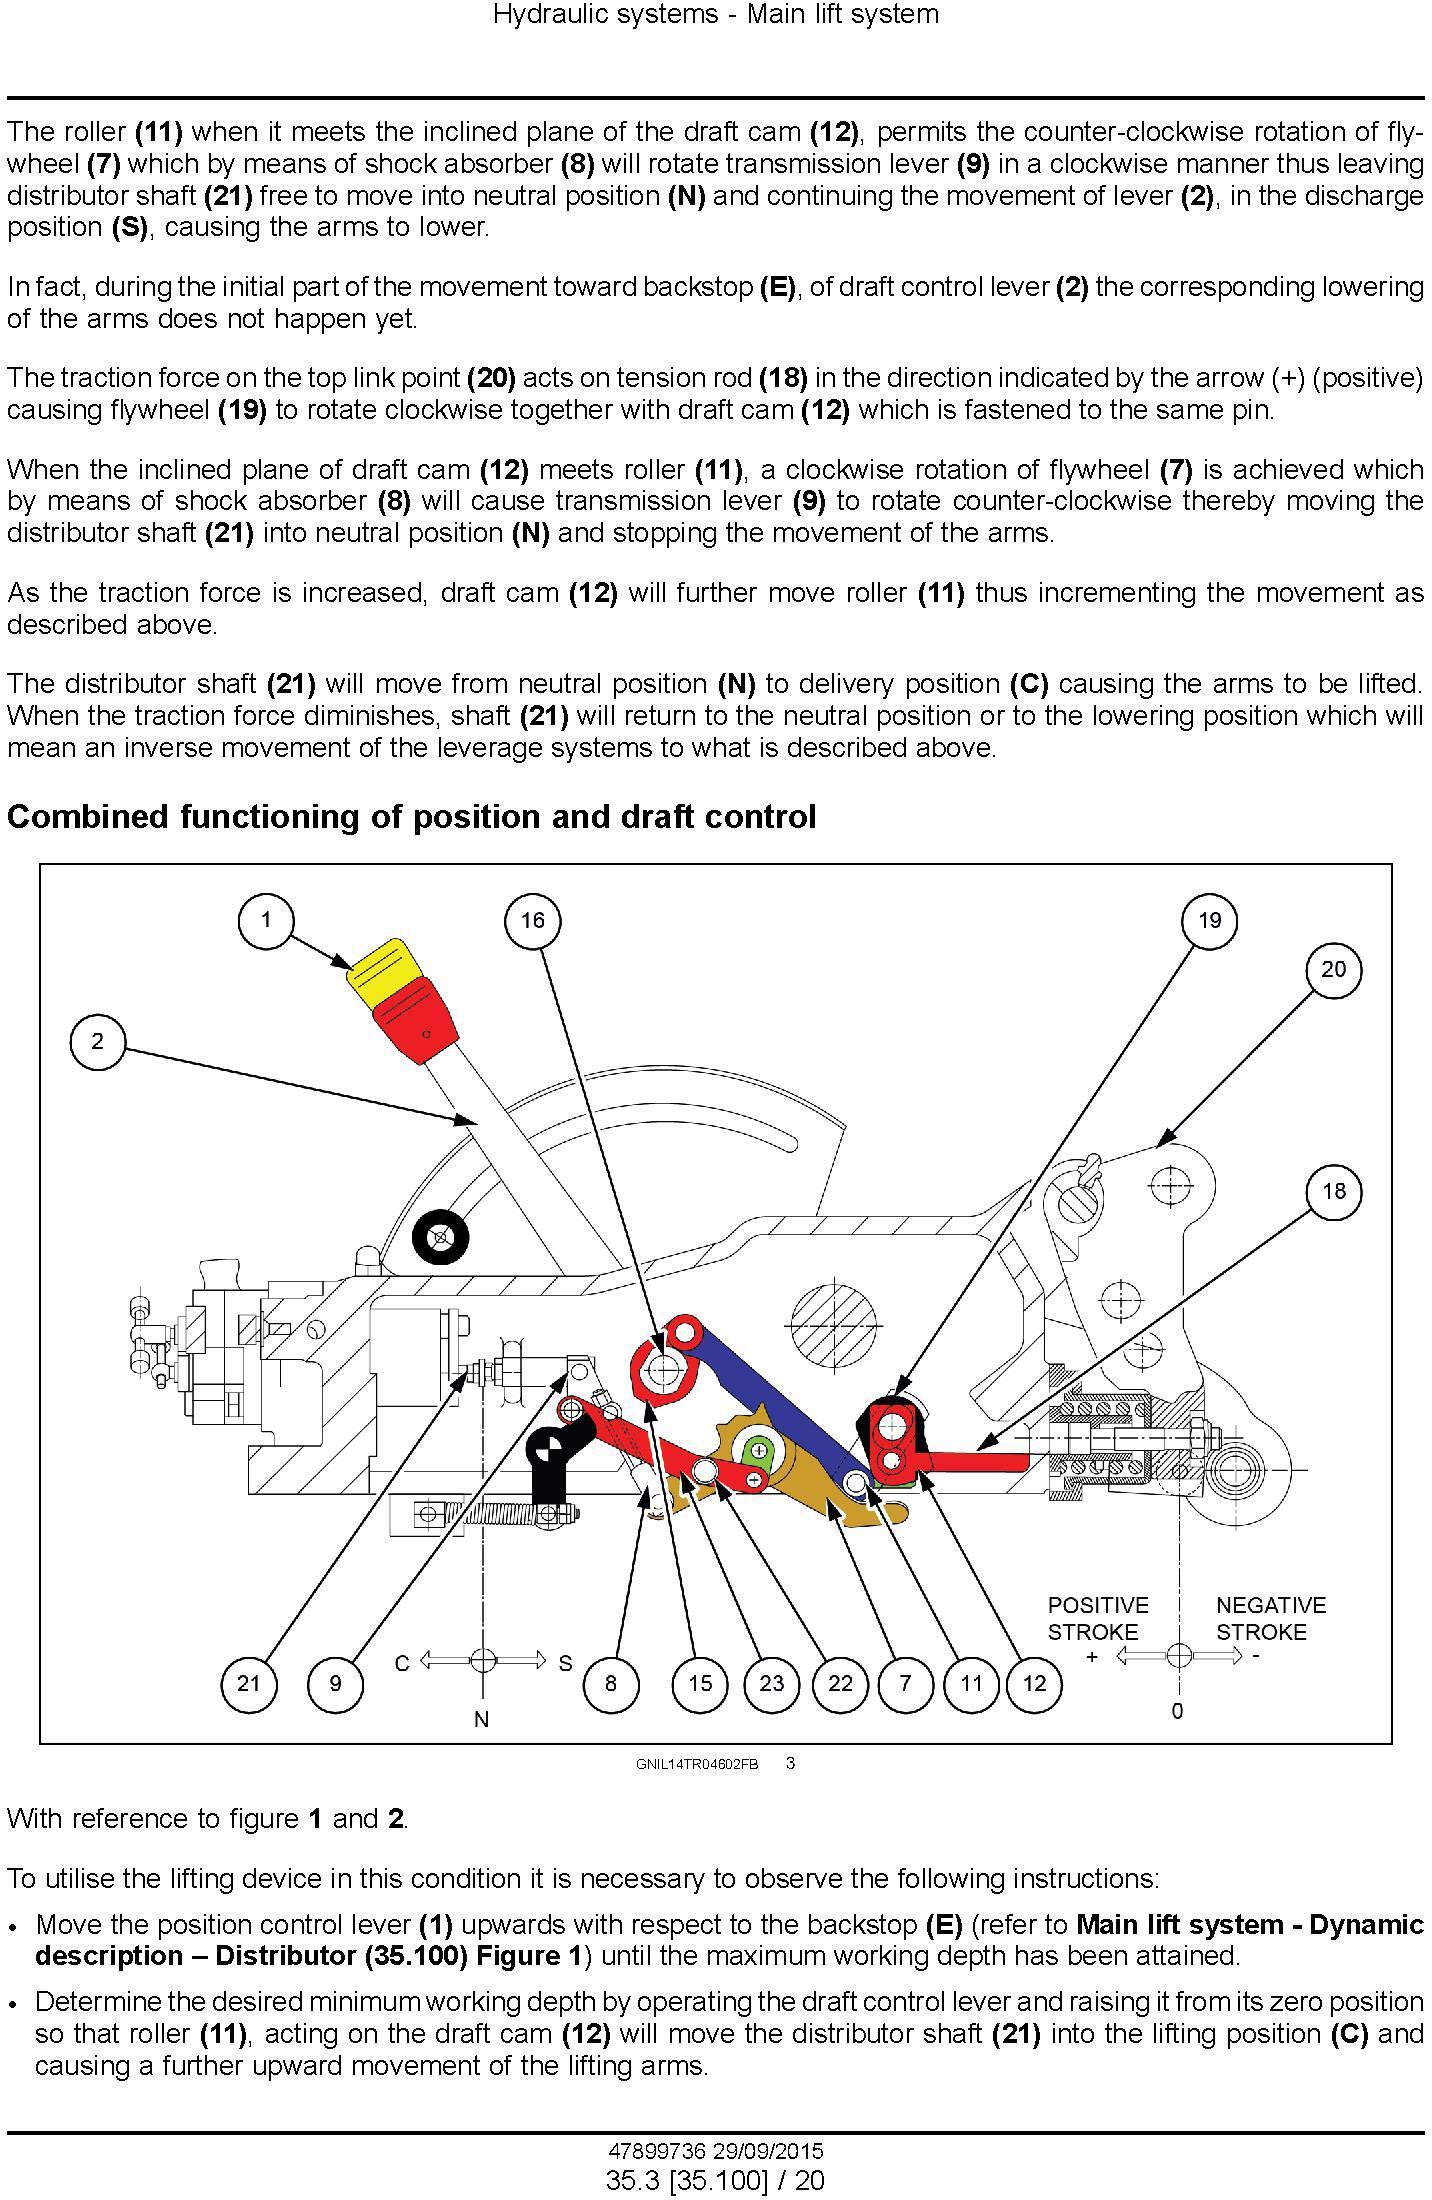 New Holland TT35, TT40, TT45 2WD or 4WD Tractor Service Manual - 3